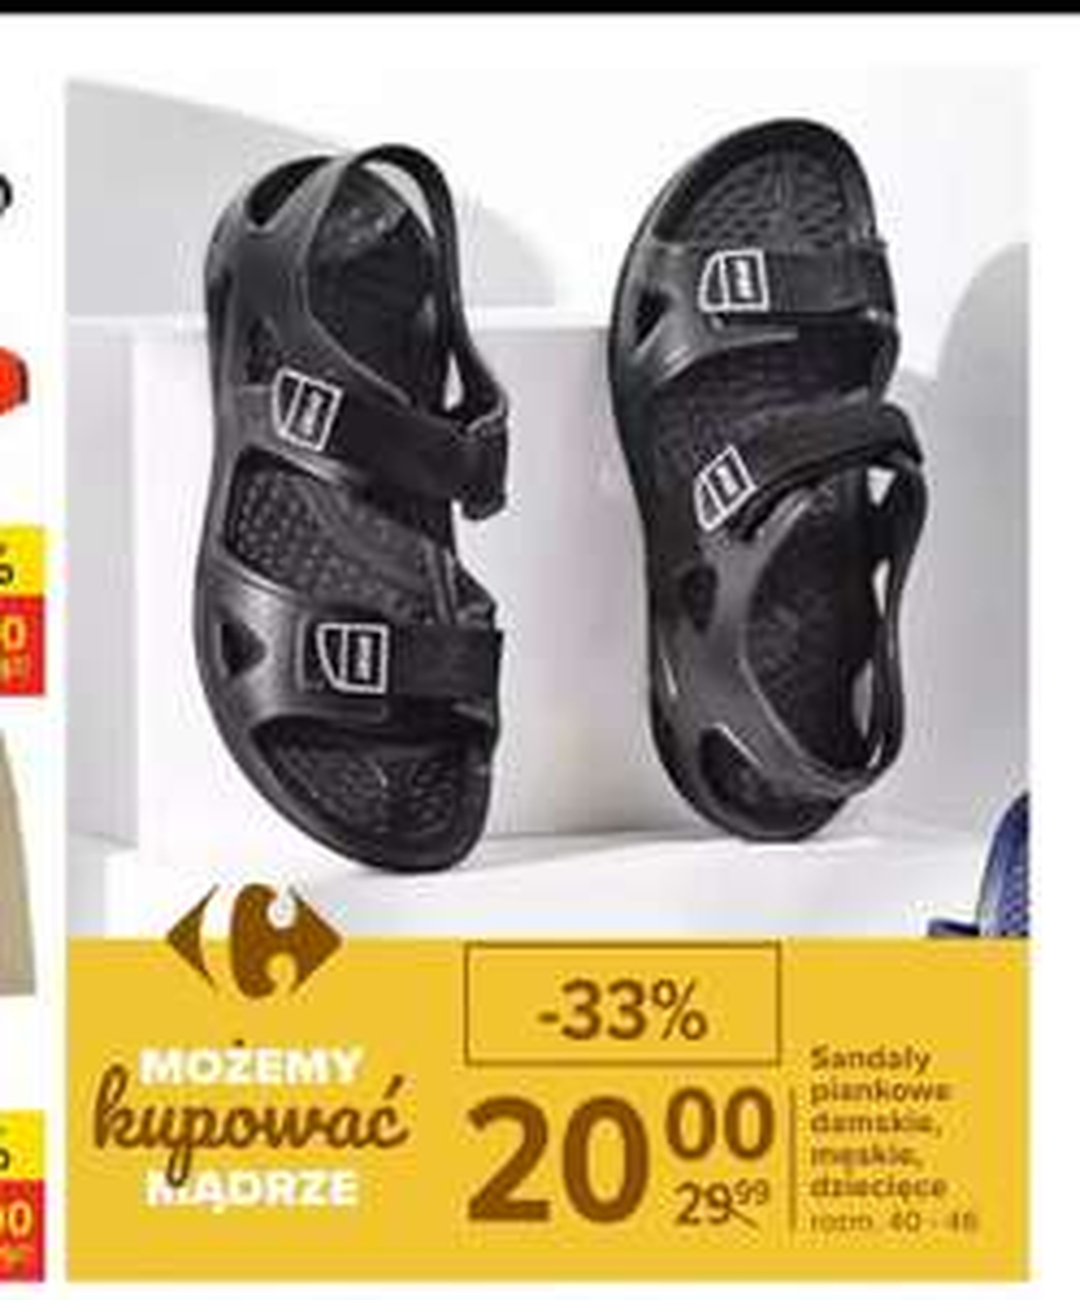 4f Sandały męskie H4L20 SAM001 czarne Pepper.pl